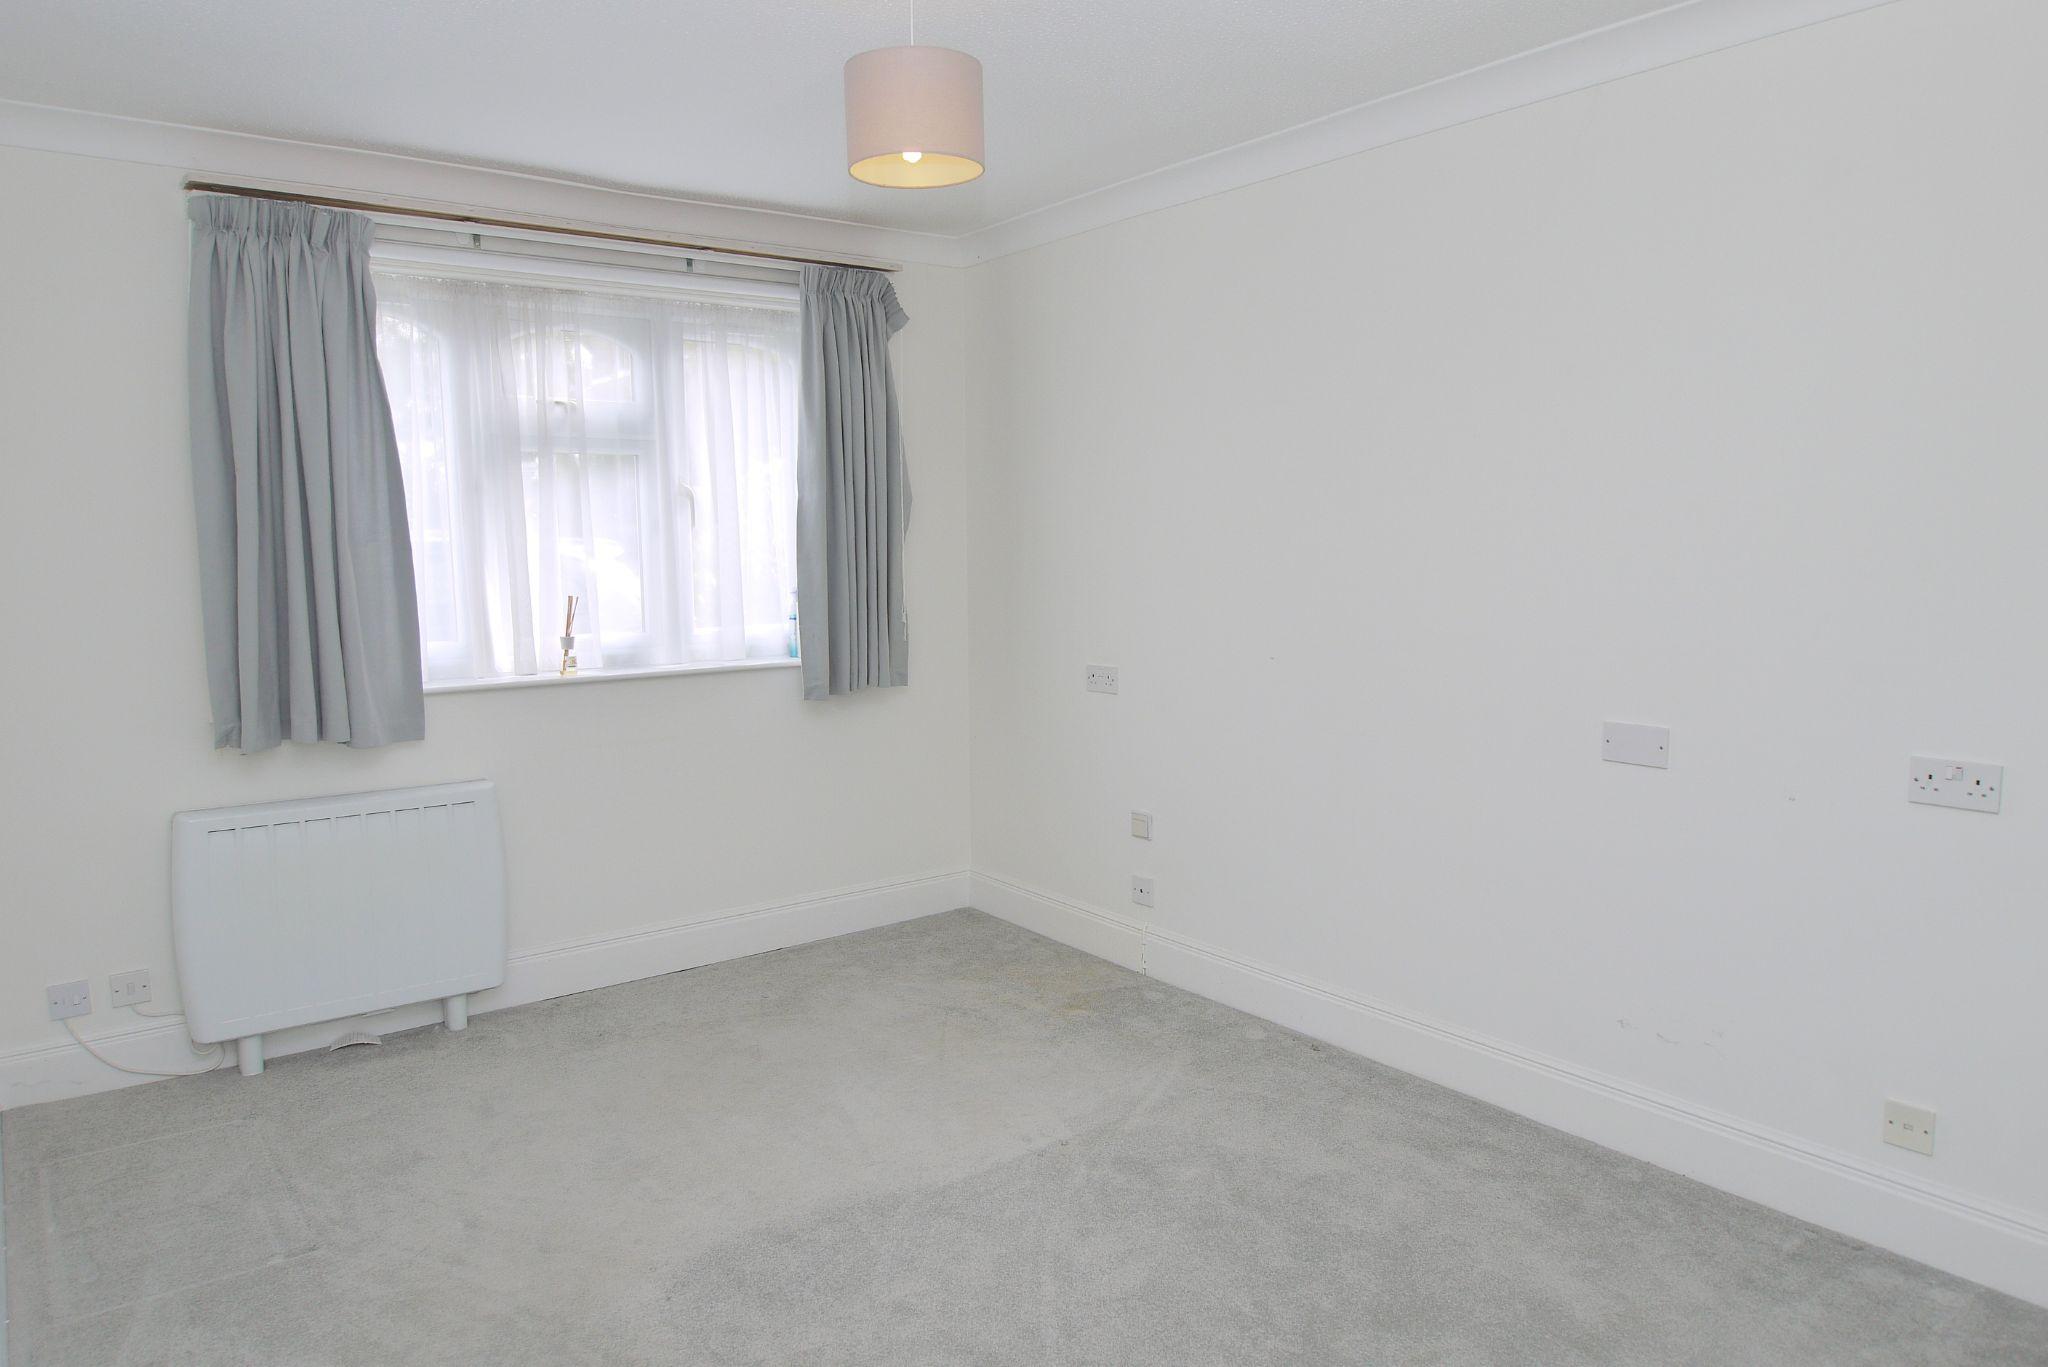 1 bedroom apartment For Sale in Sevenoaks - Photograph 5